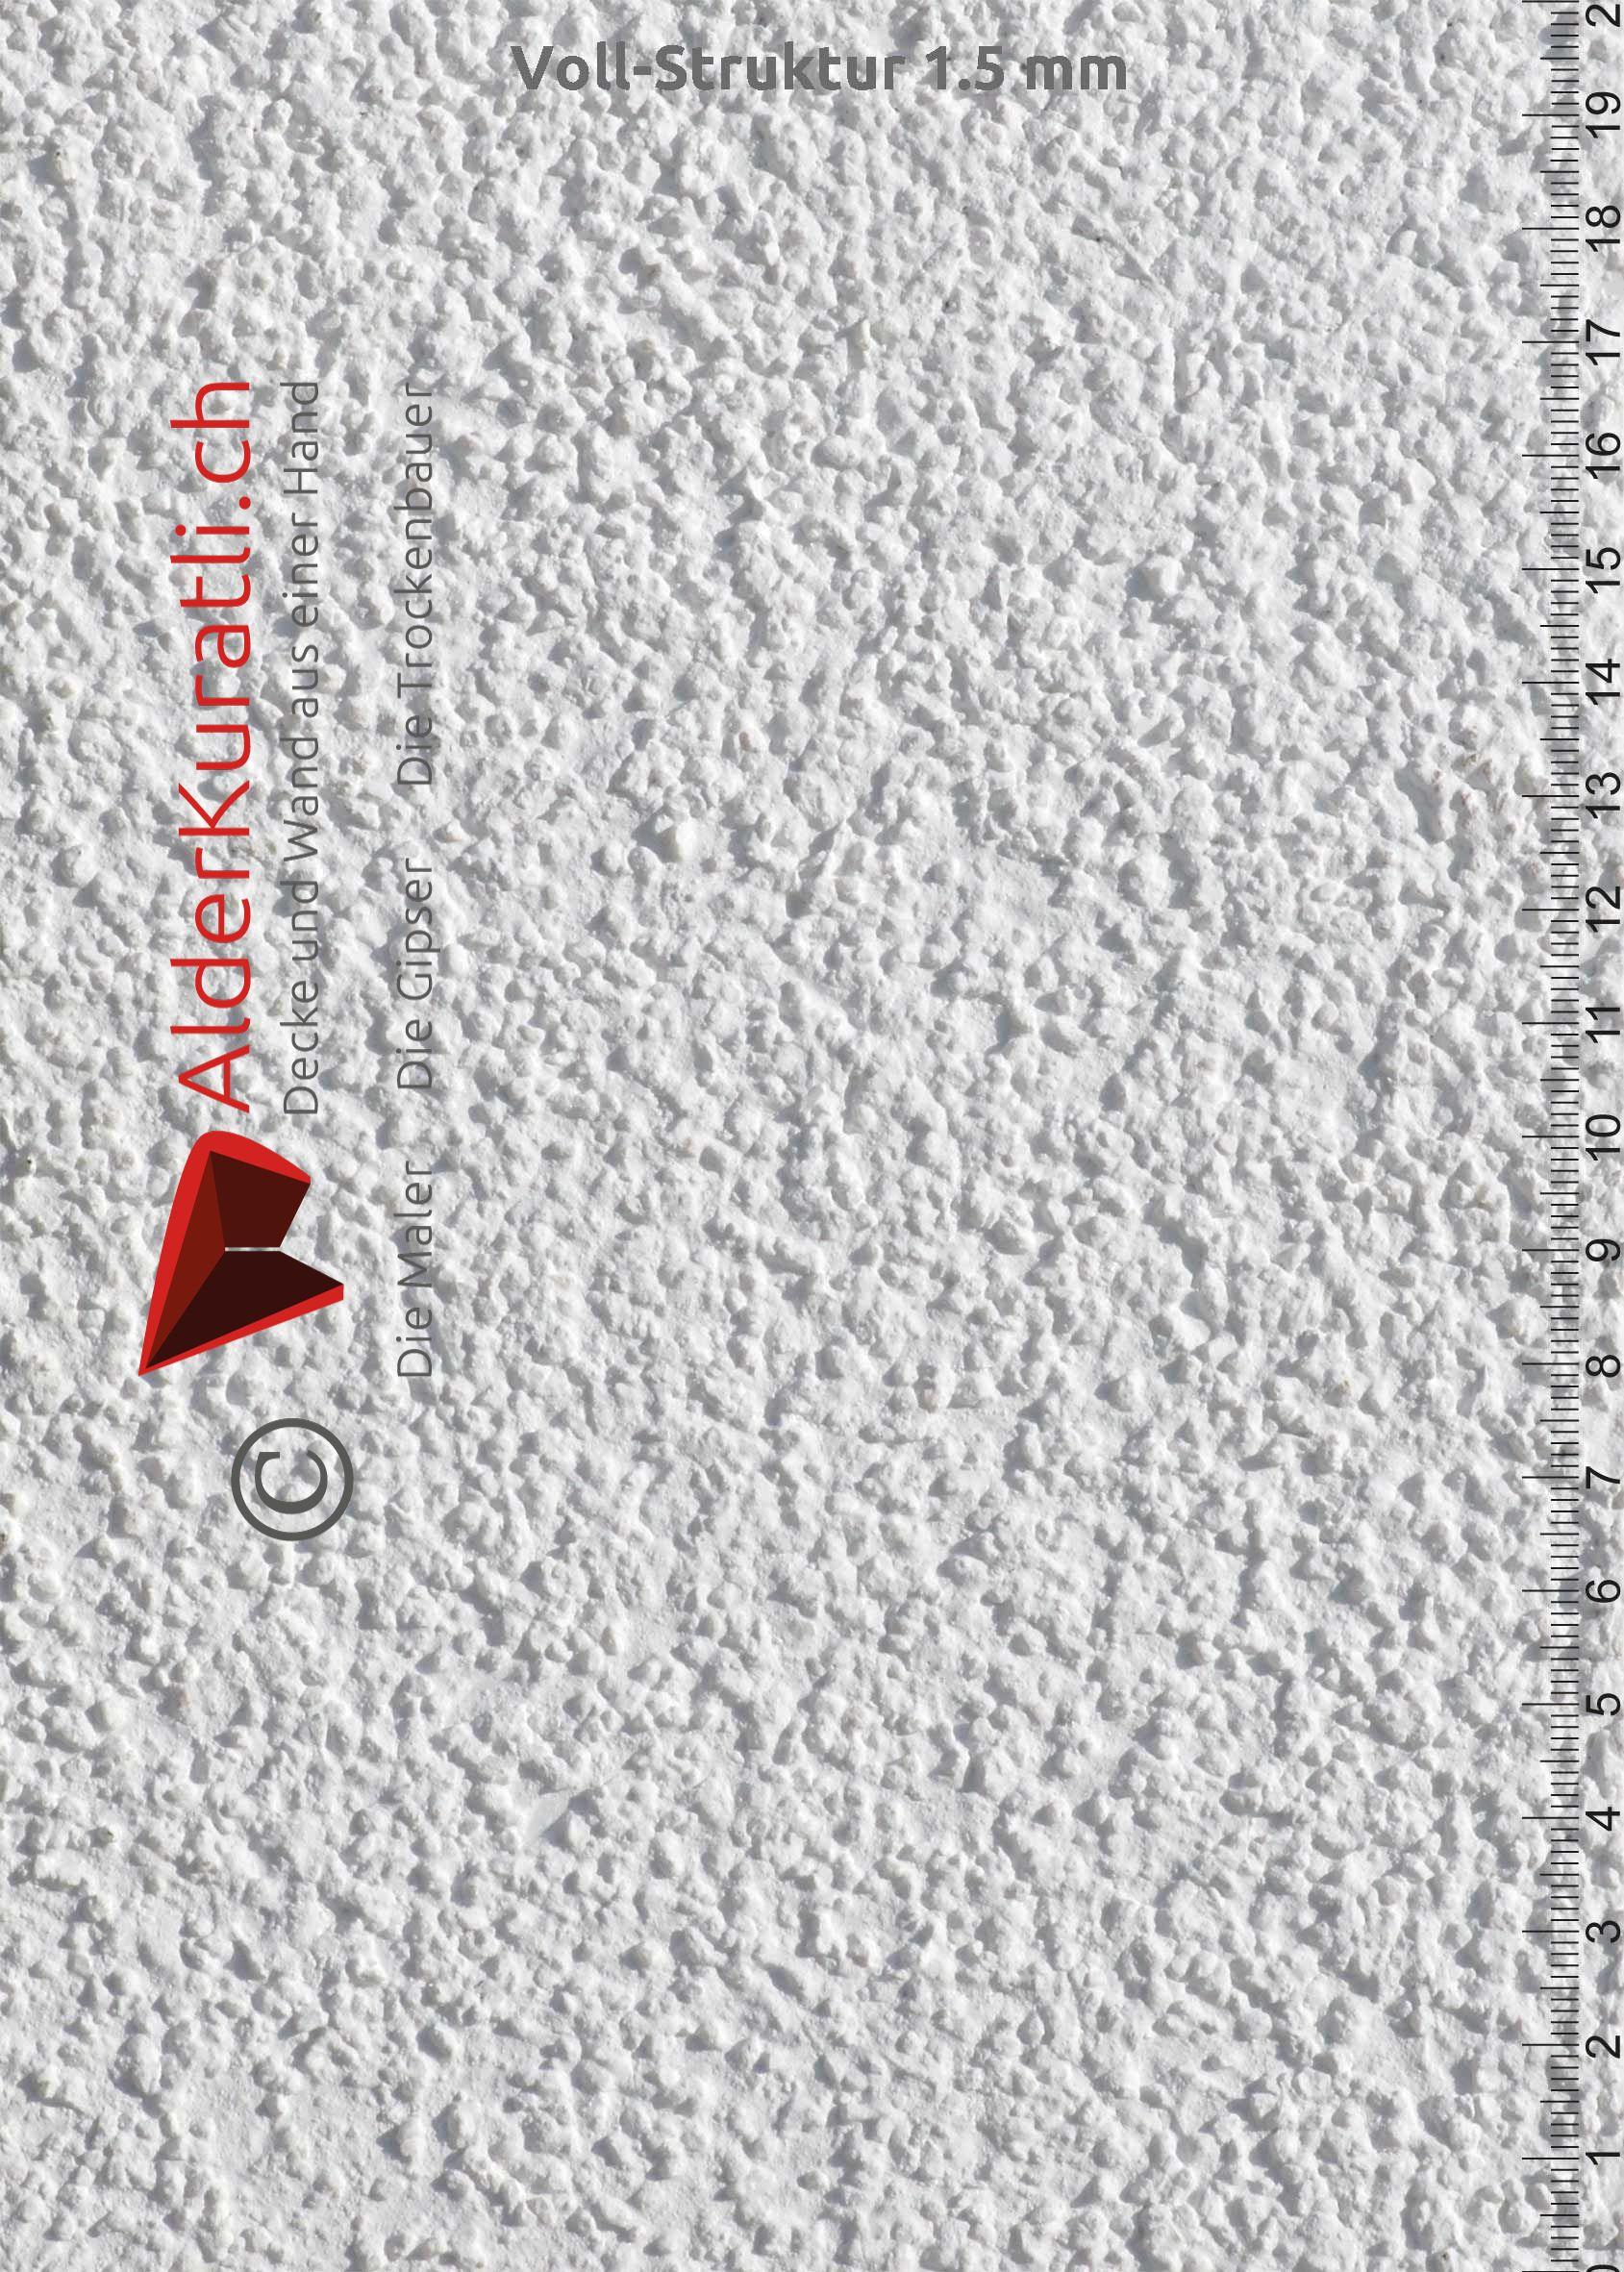 Voll-Struktur_1-5mm